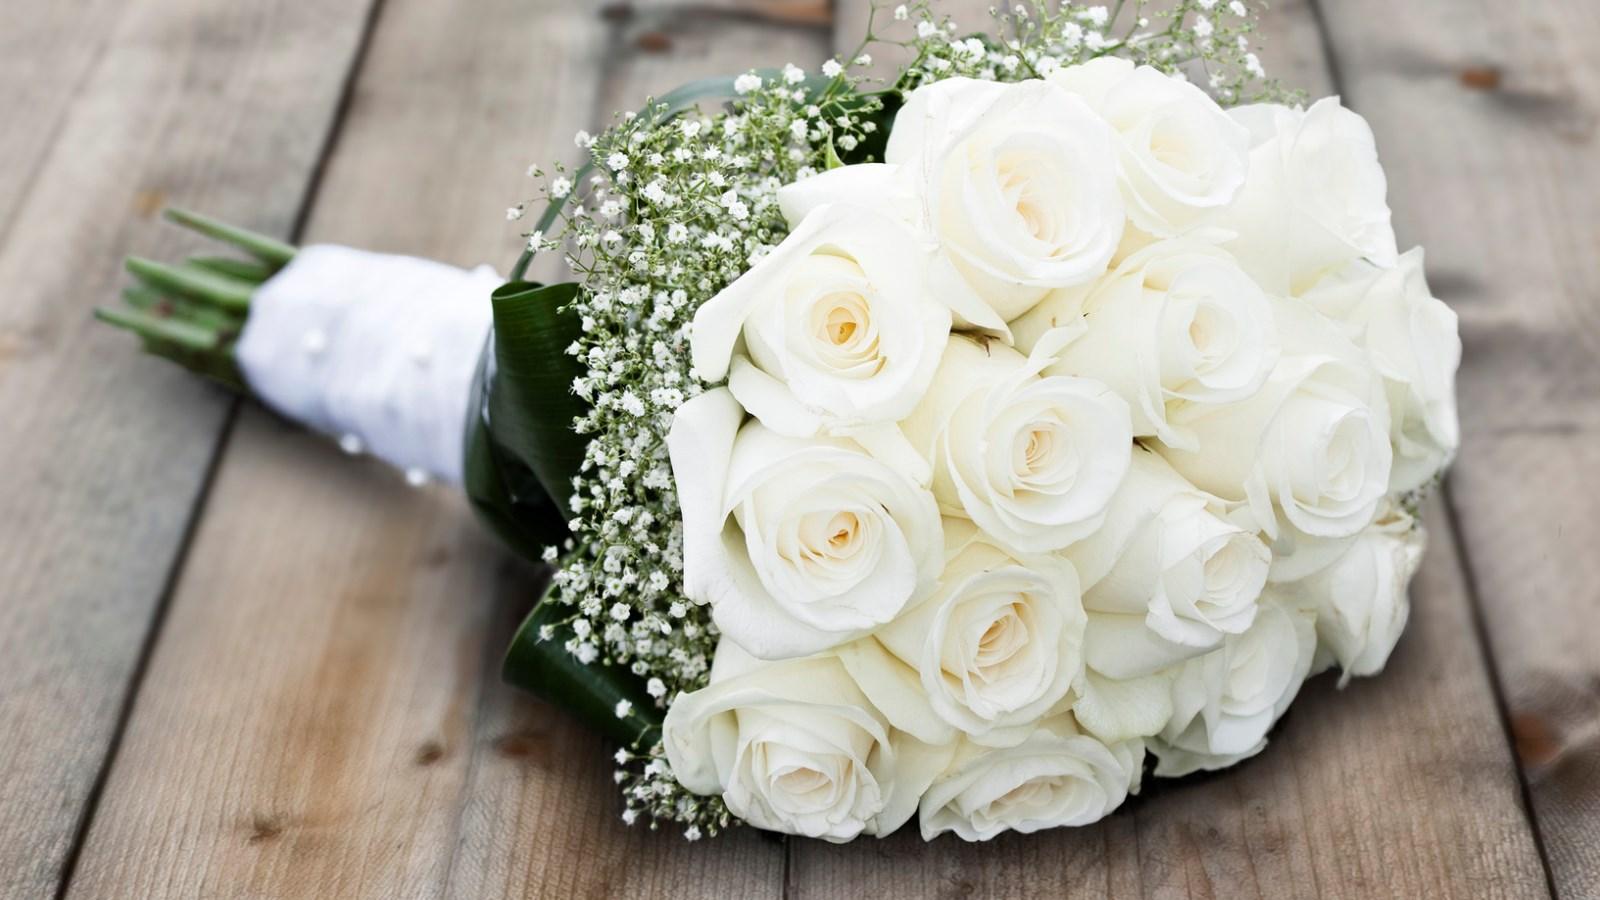 fpt-112704-Wedding-Flowers.jpg